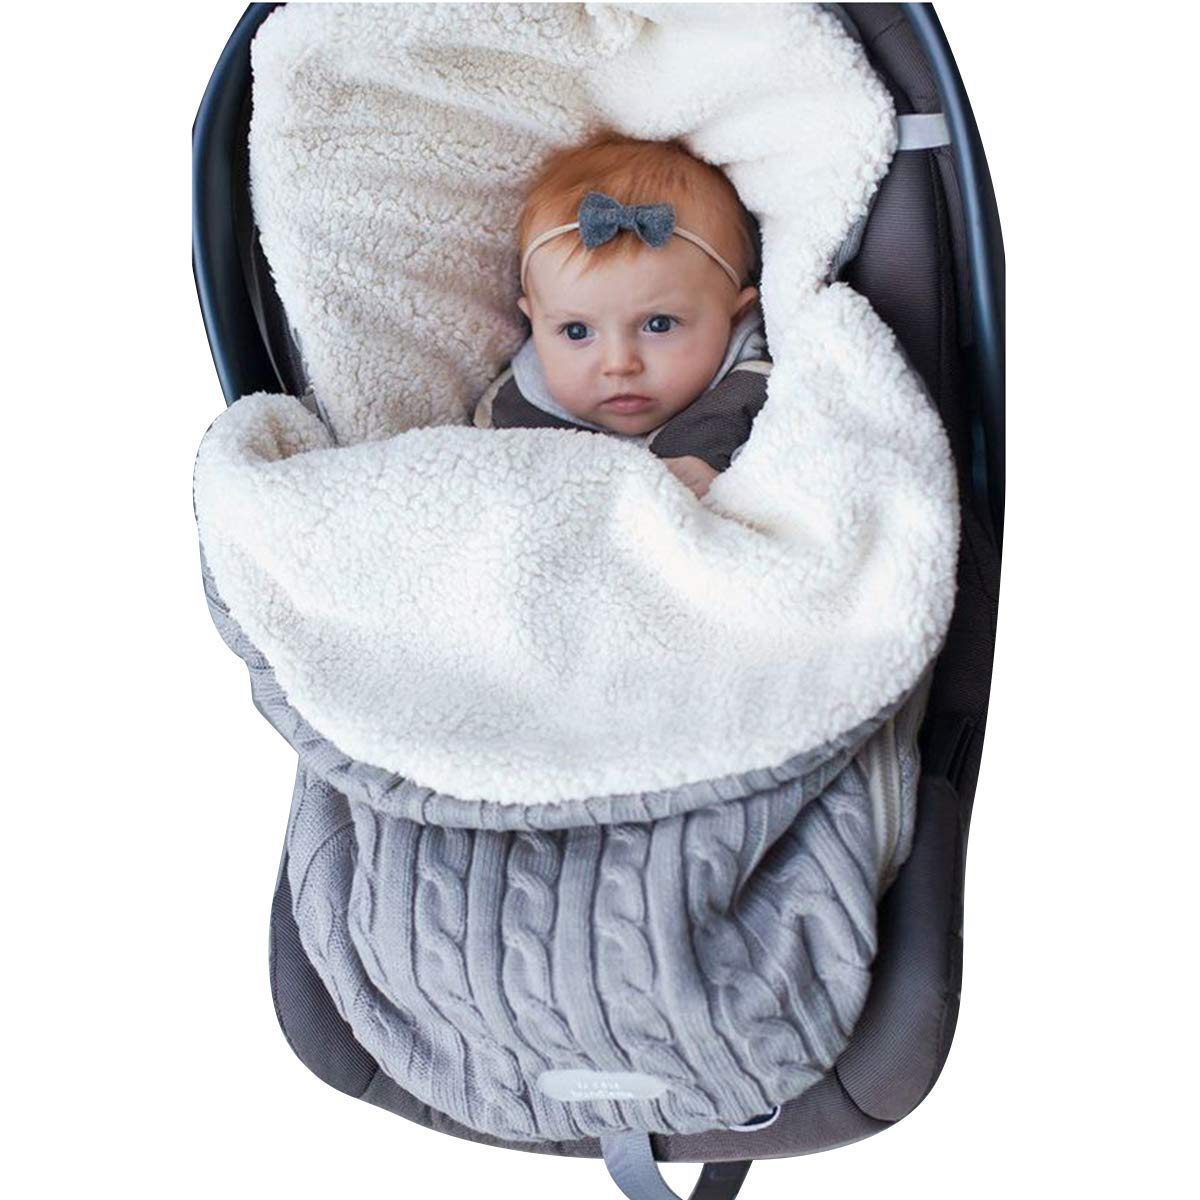 Newborn Baby Swaddle Blanket Wrap, Thick Baby Kids Toddler Knit Soft Warm Fleece Blanket Swaddle Sleeping Bag Sleep Sack Stroller Unisex Wrap for 0-12 Month Baby Boys Girls (Grey) Steerfr